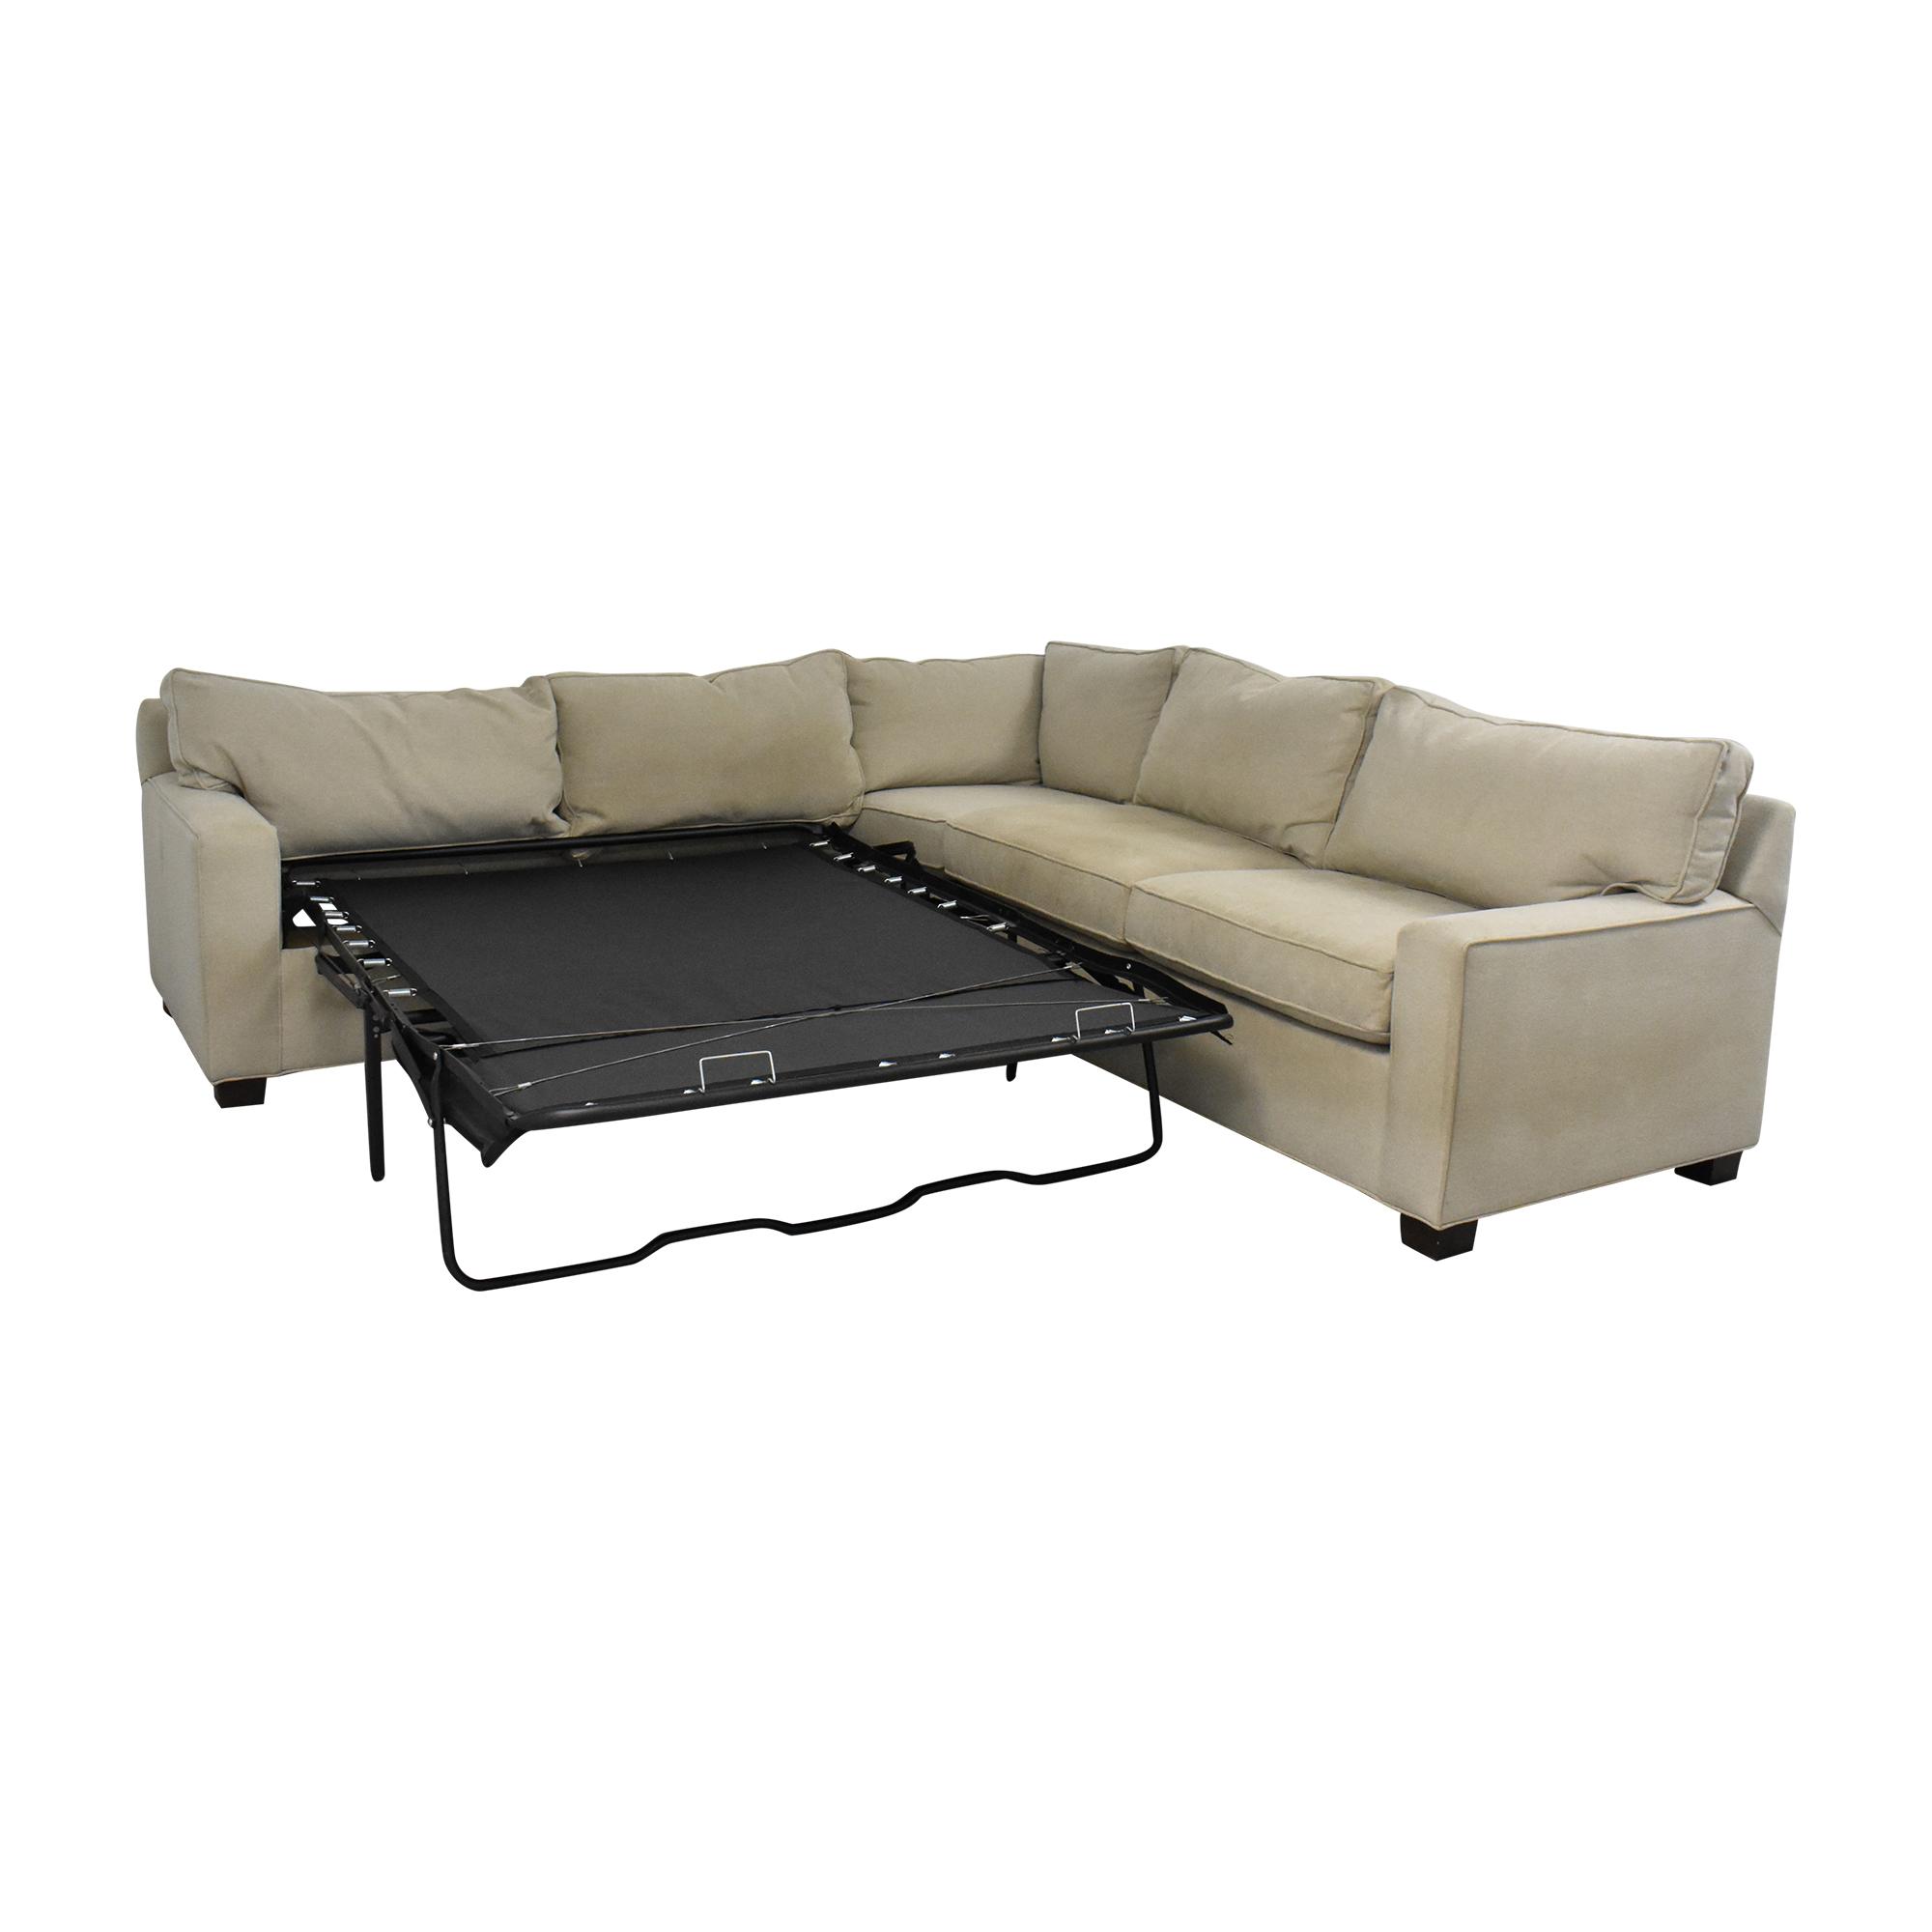 Mitchell Gold + Bob Williams Mitchell Gold + Bob Williams Sectional Sleeper Sofa used